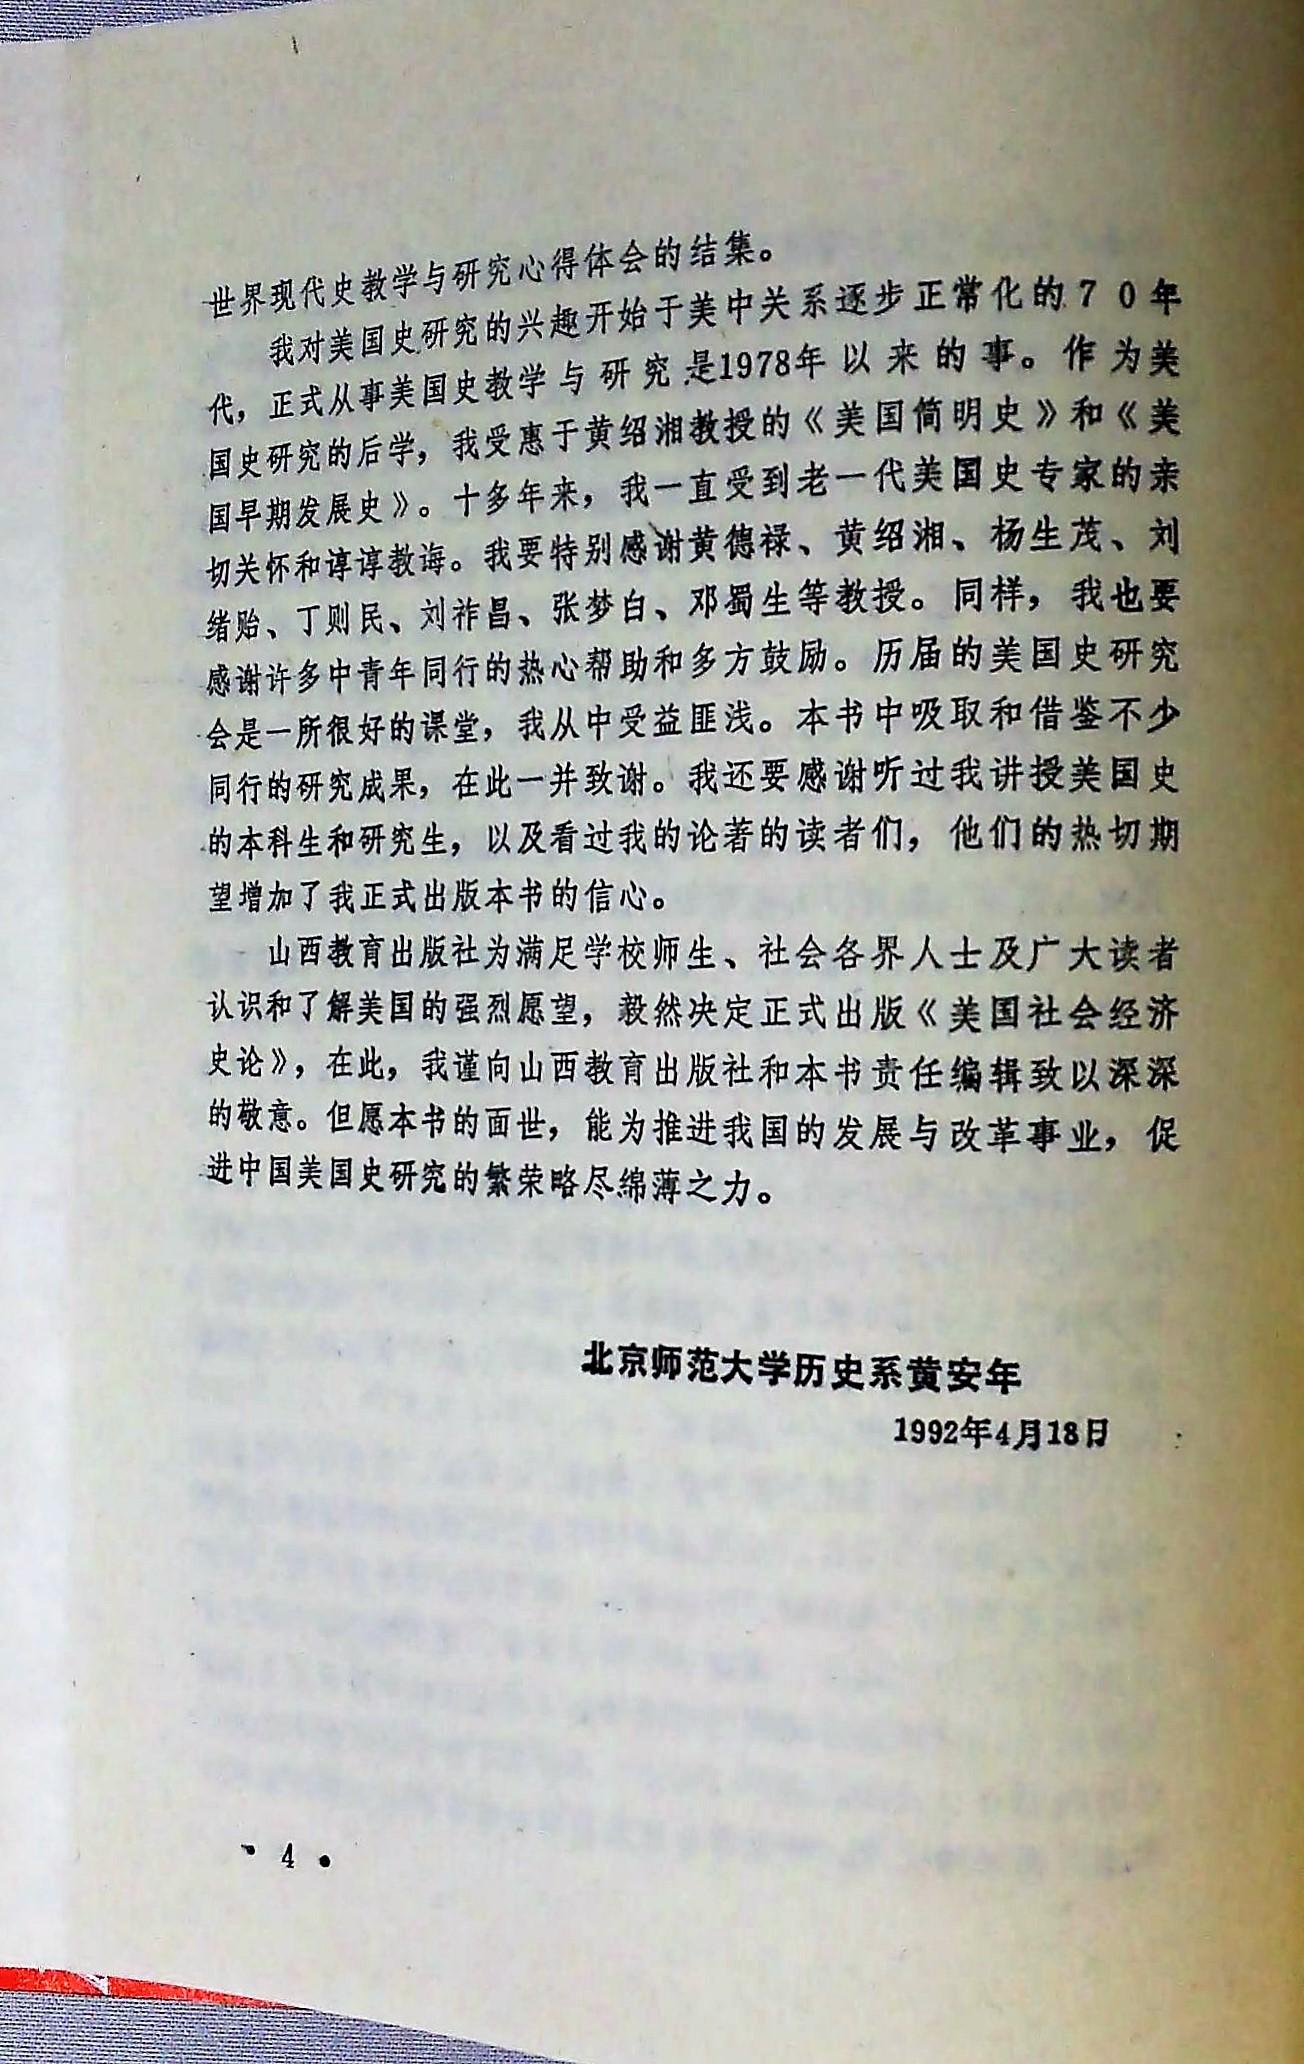 6 IMG540.jpg